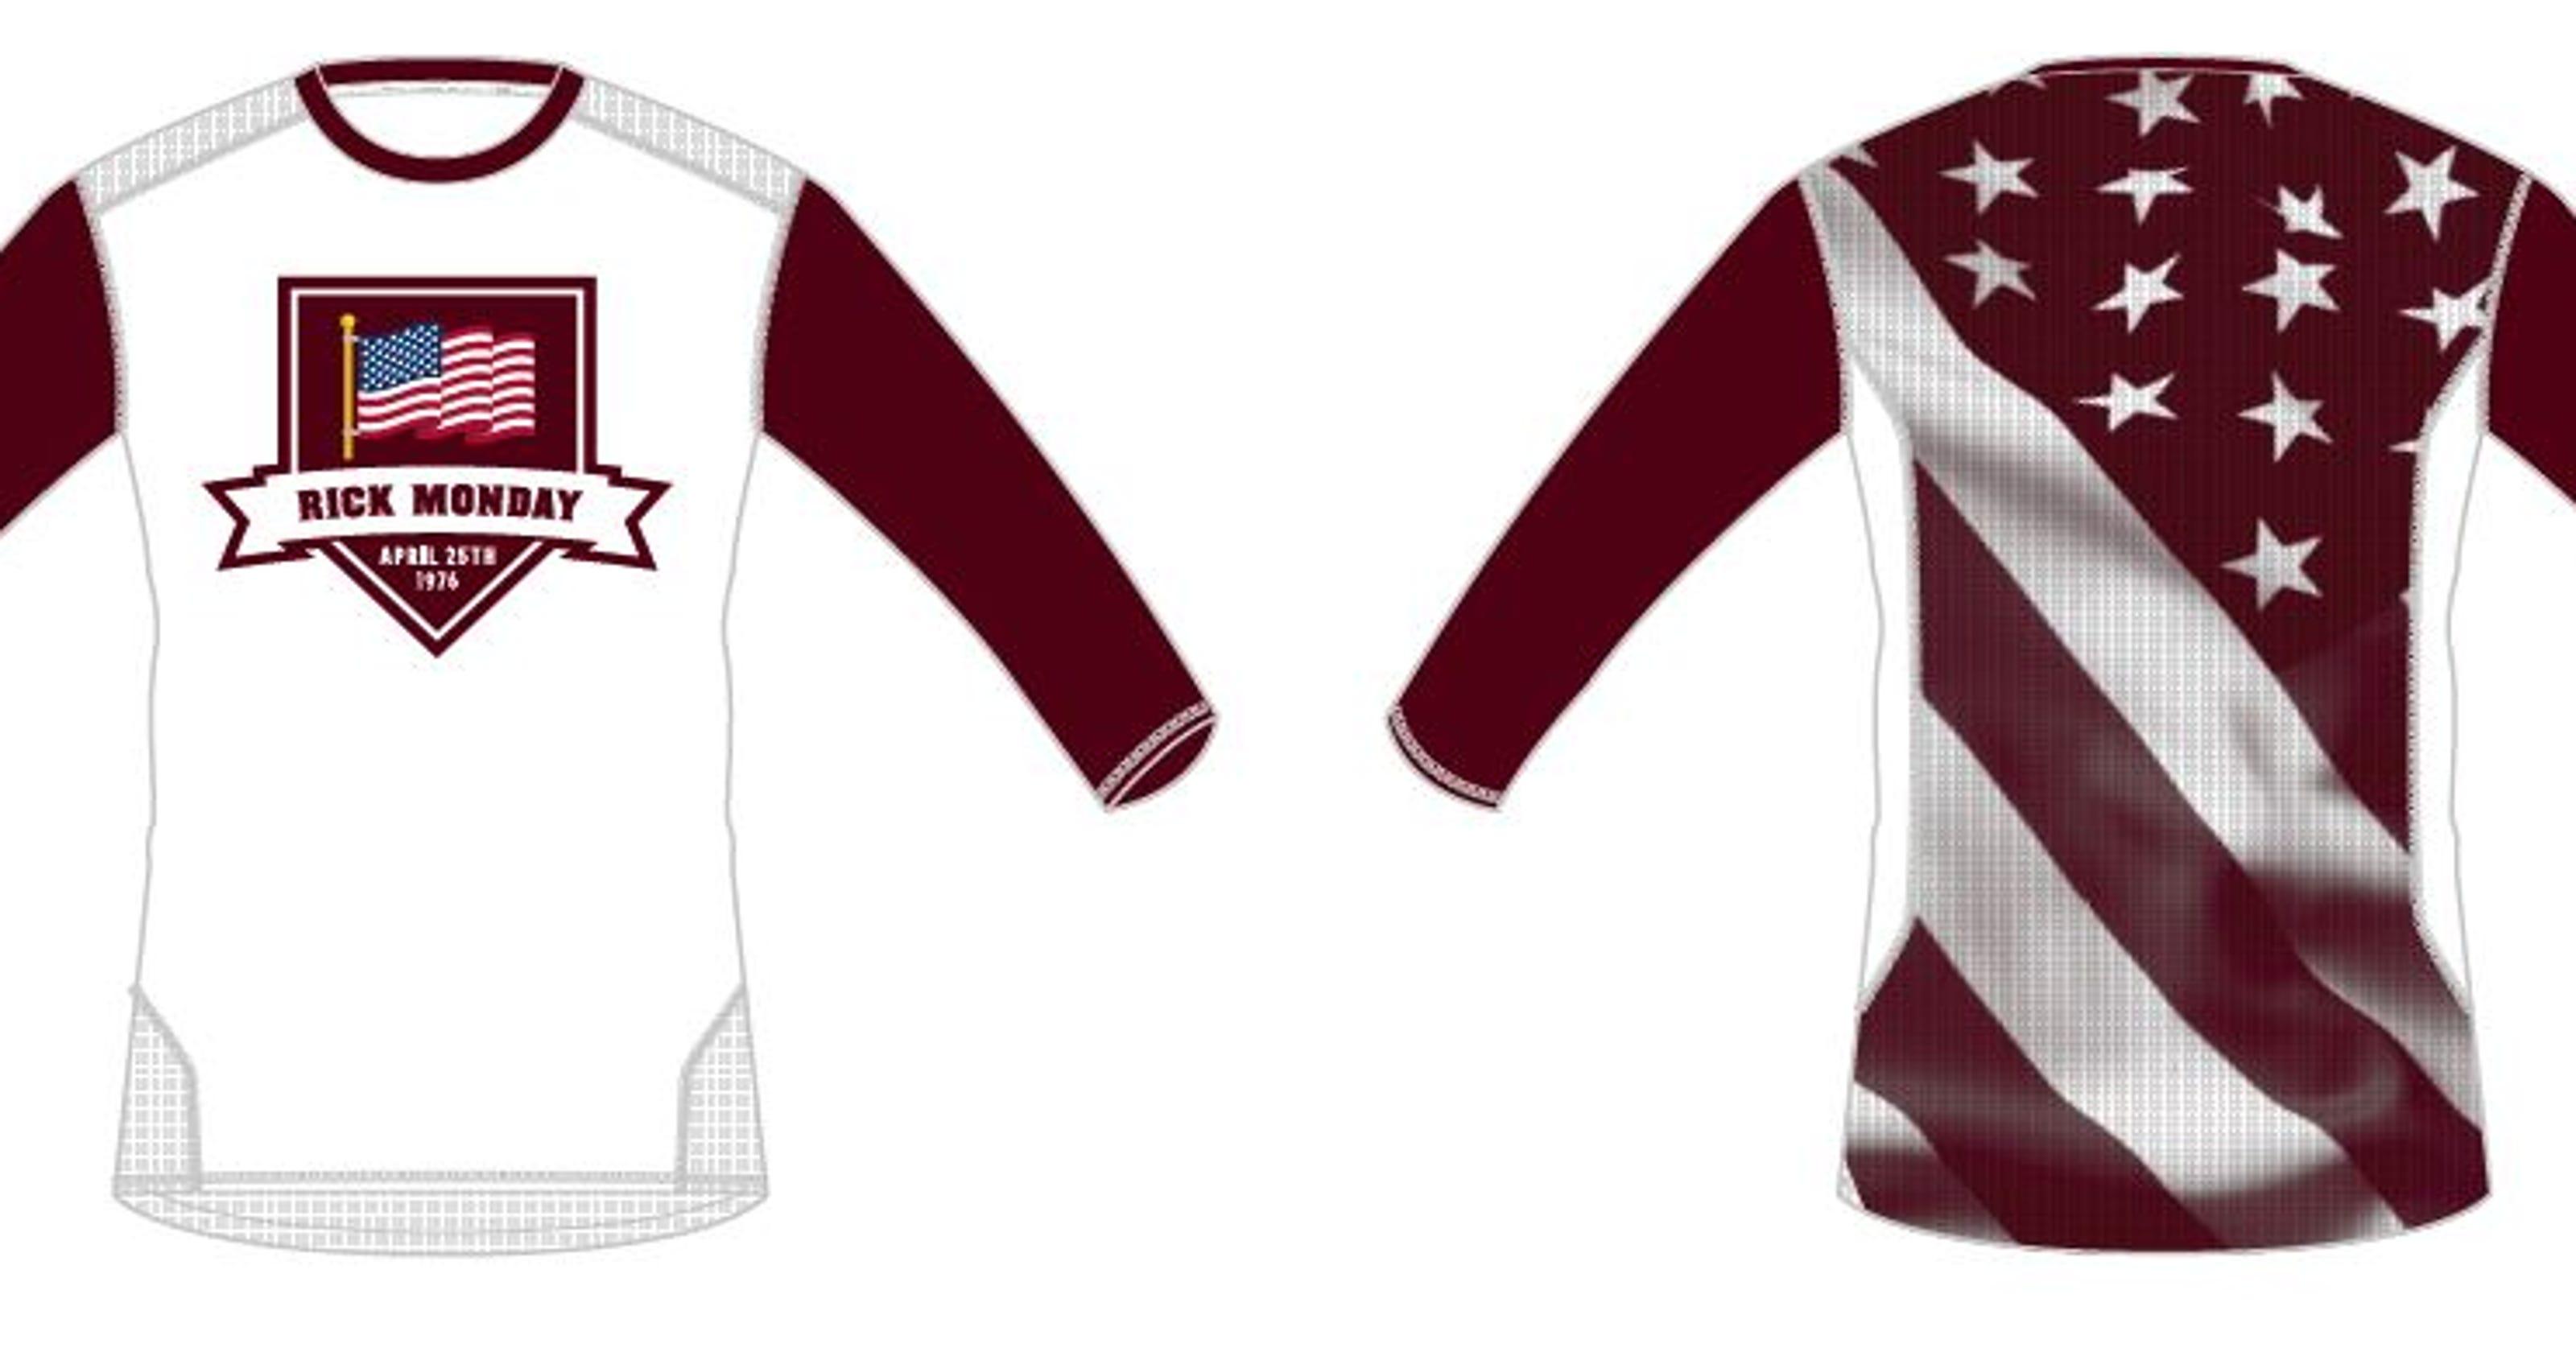 024ac0fc61f ASU baseball to honor Rick Monday with special flag uniform